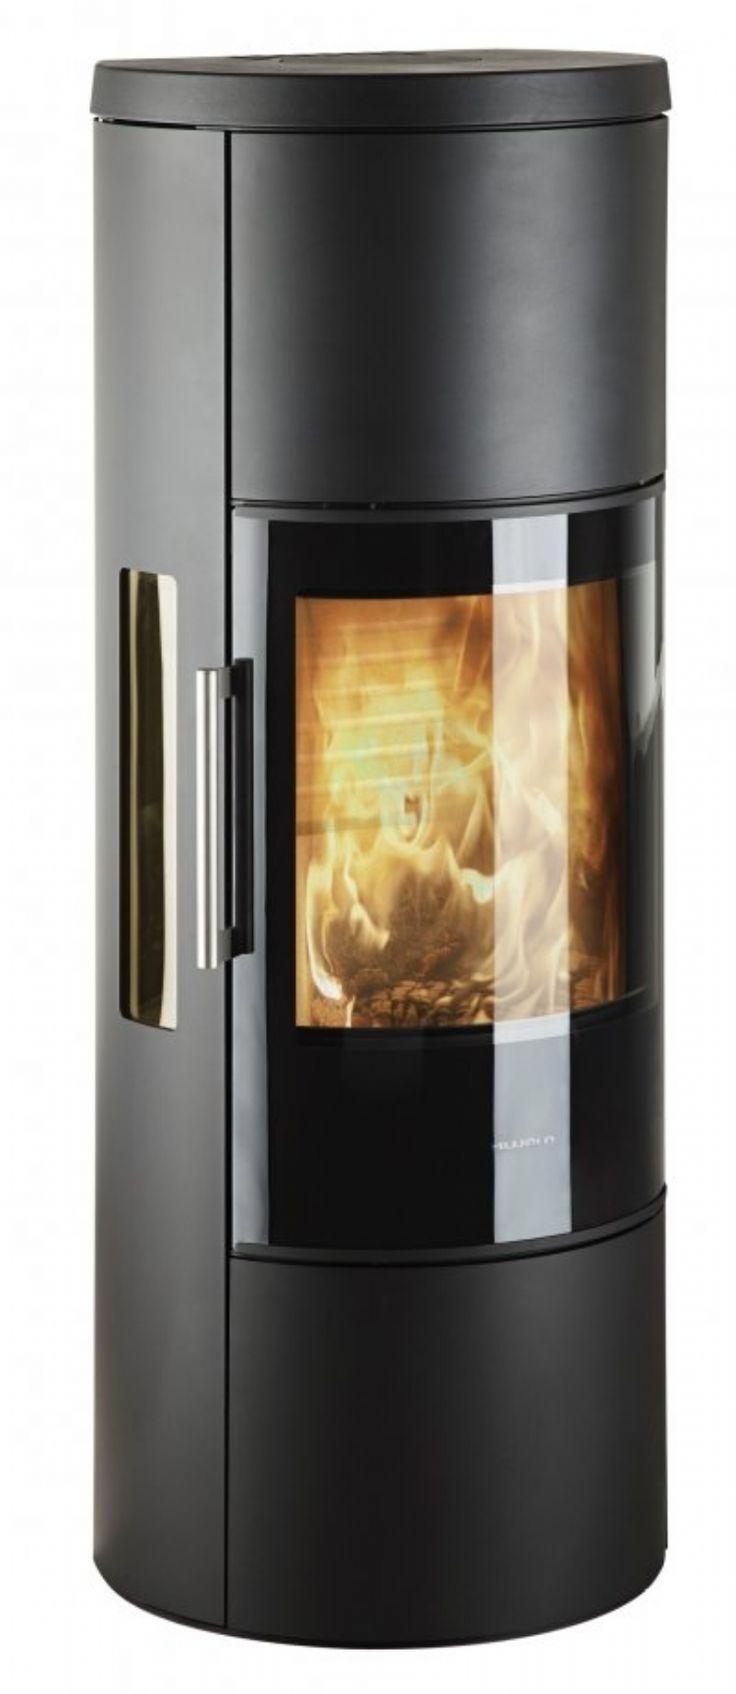 37 best hwam images on pinterest wood burning stoves stove